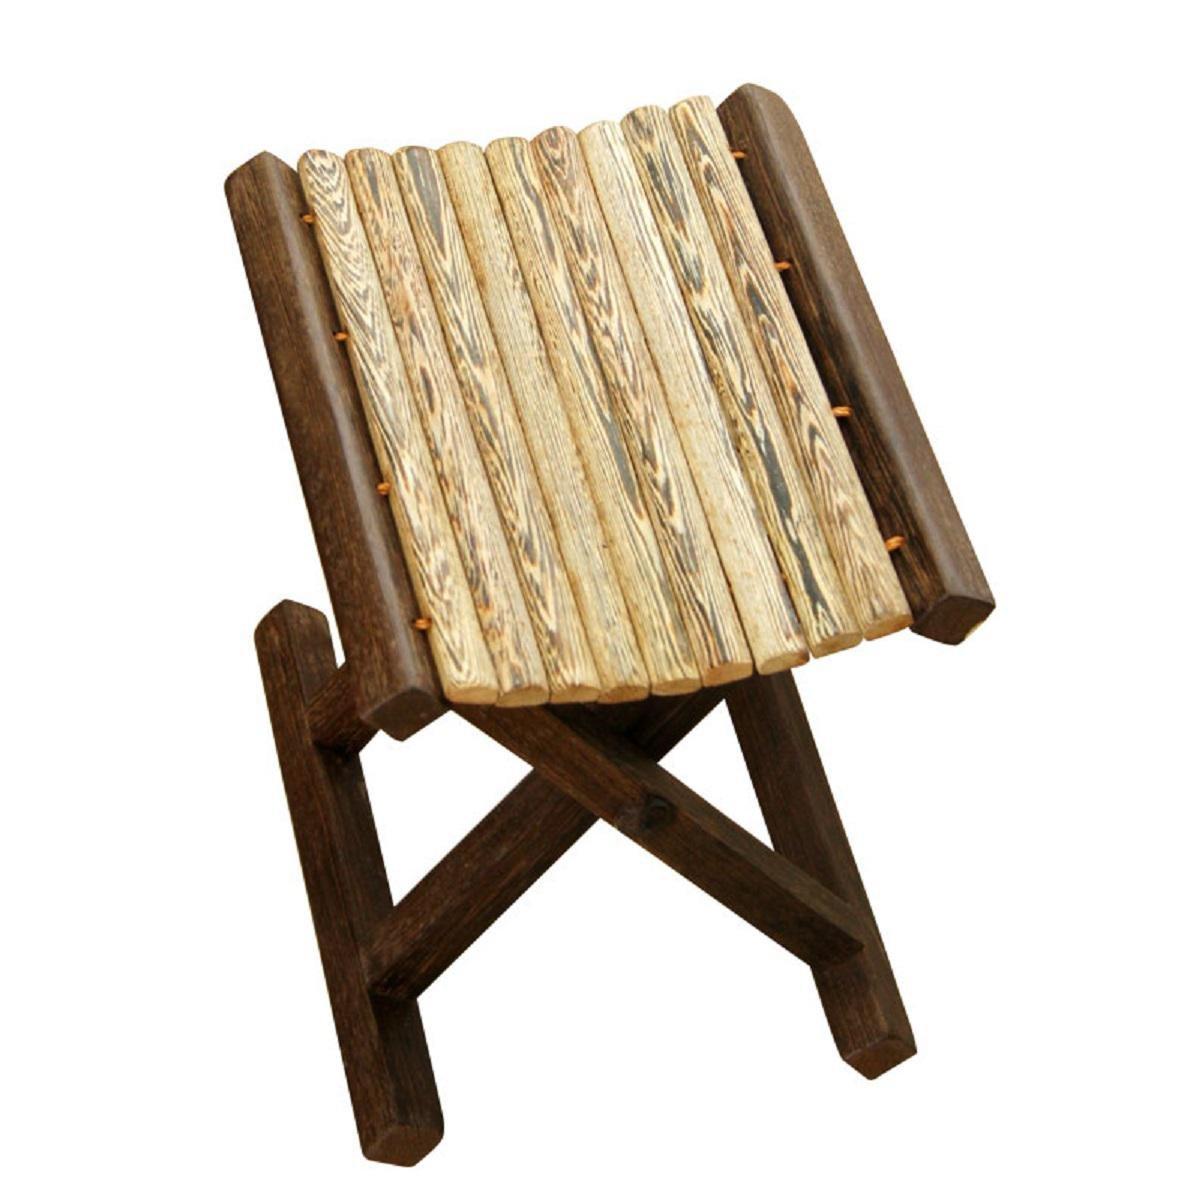 GAOJIAN Retro Stools Solid Wood Campstool Folding Stool Outdoors Portable Fishing Stools Courtyard Stools , b